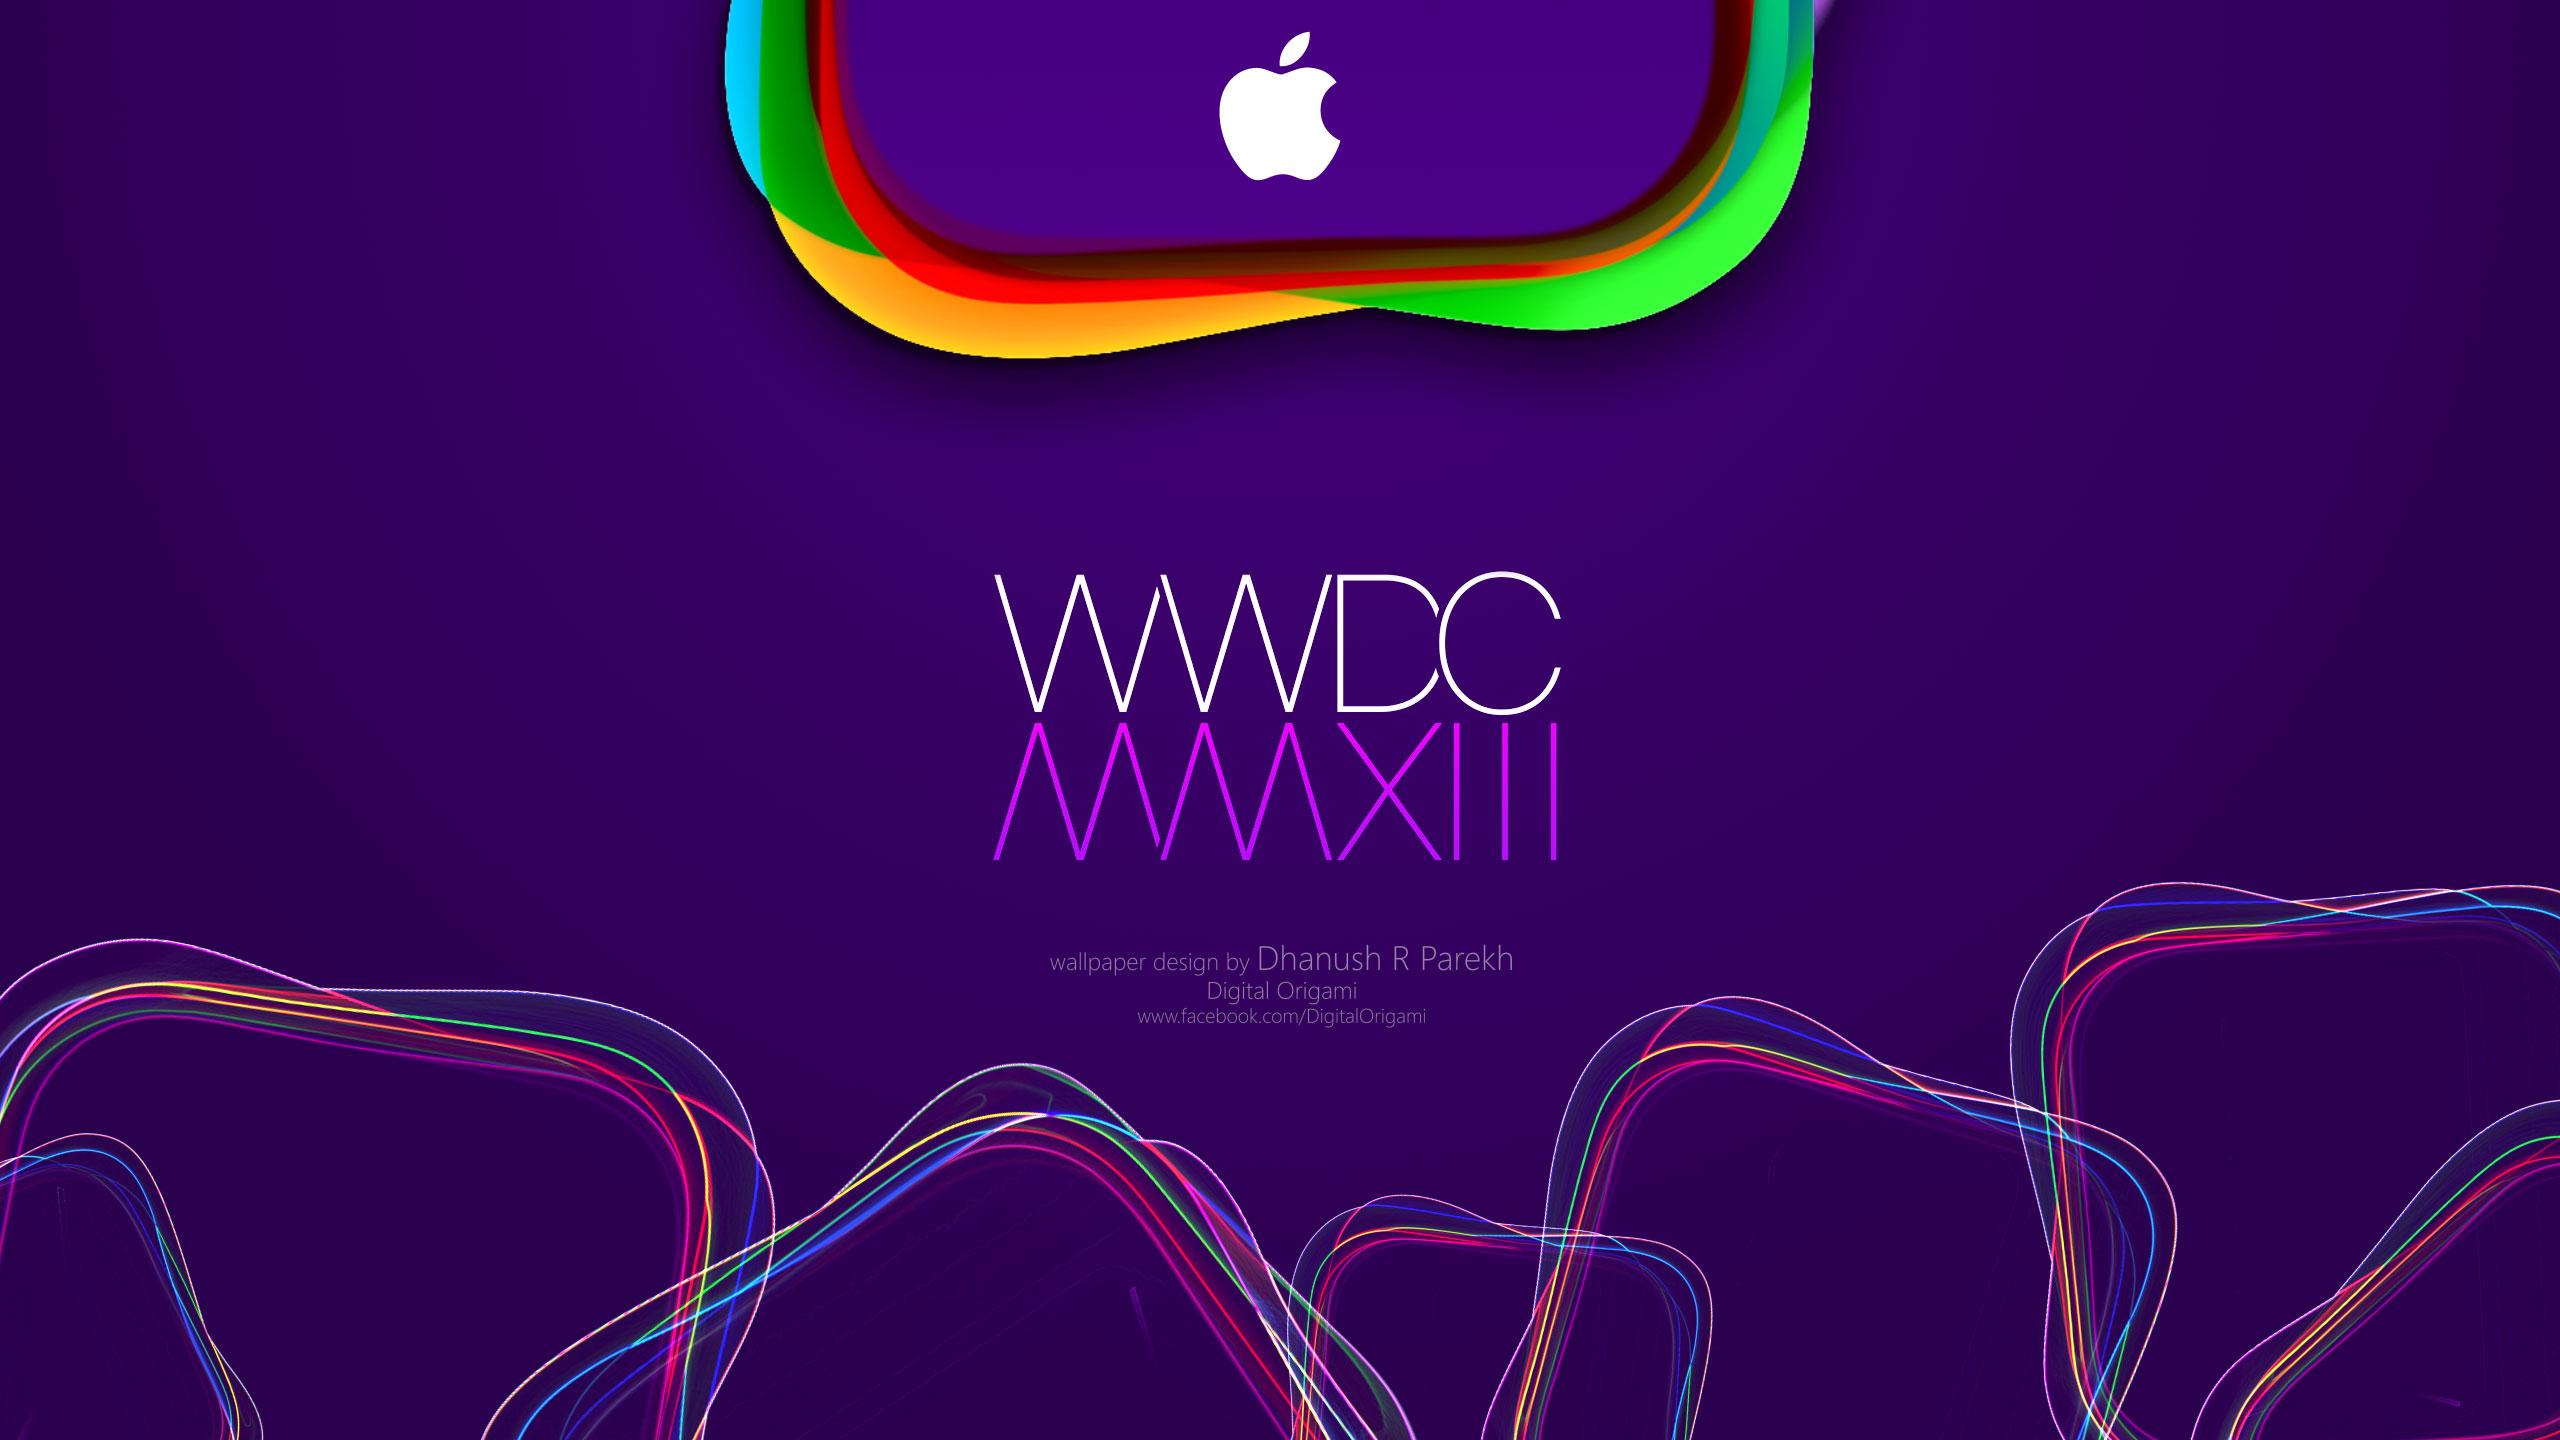 apple_wwdc_2013_wallpaper_by_dhanushparekh-d62xdhq